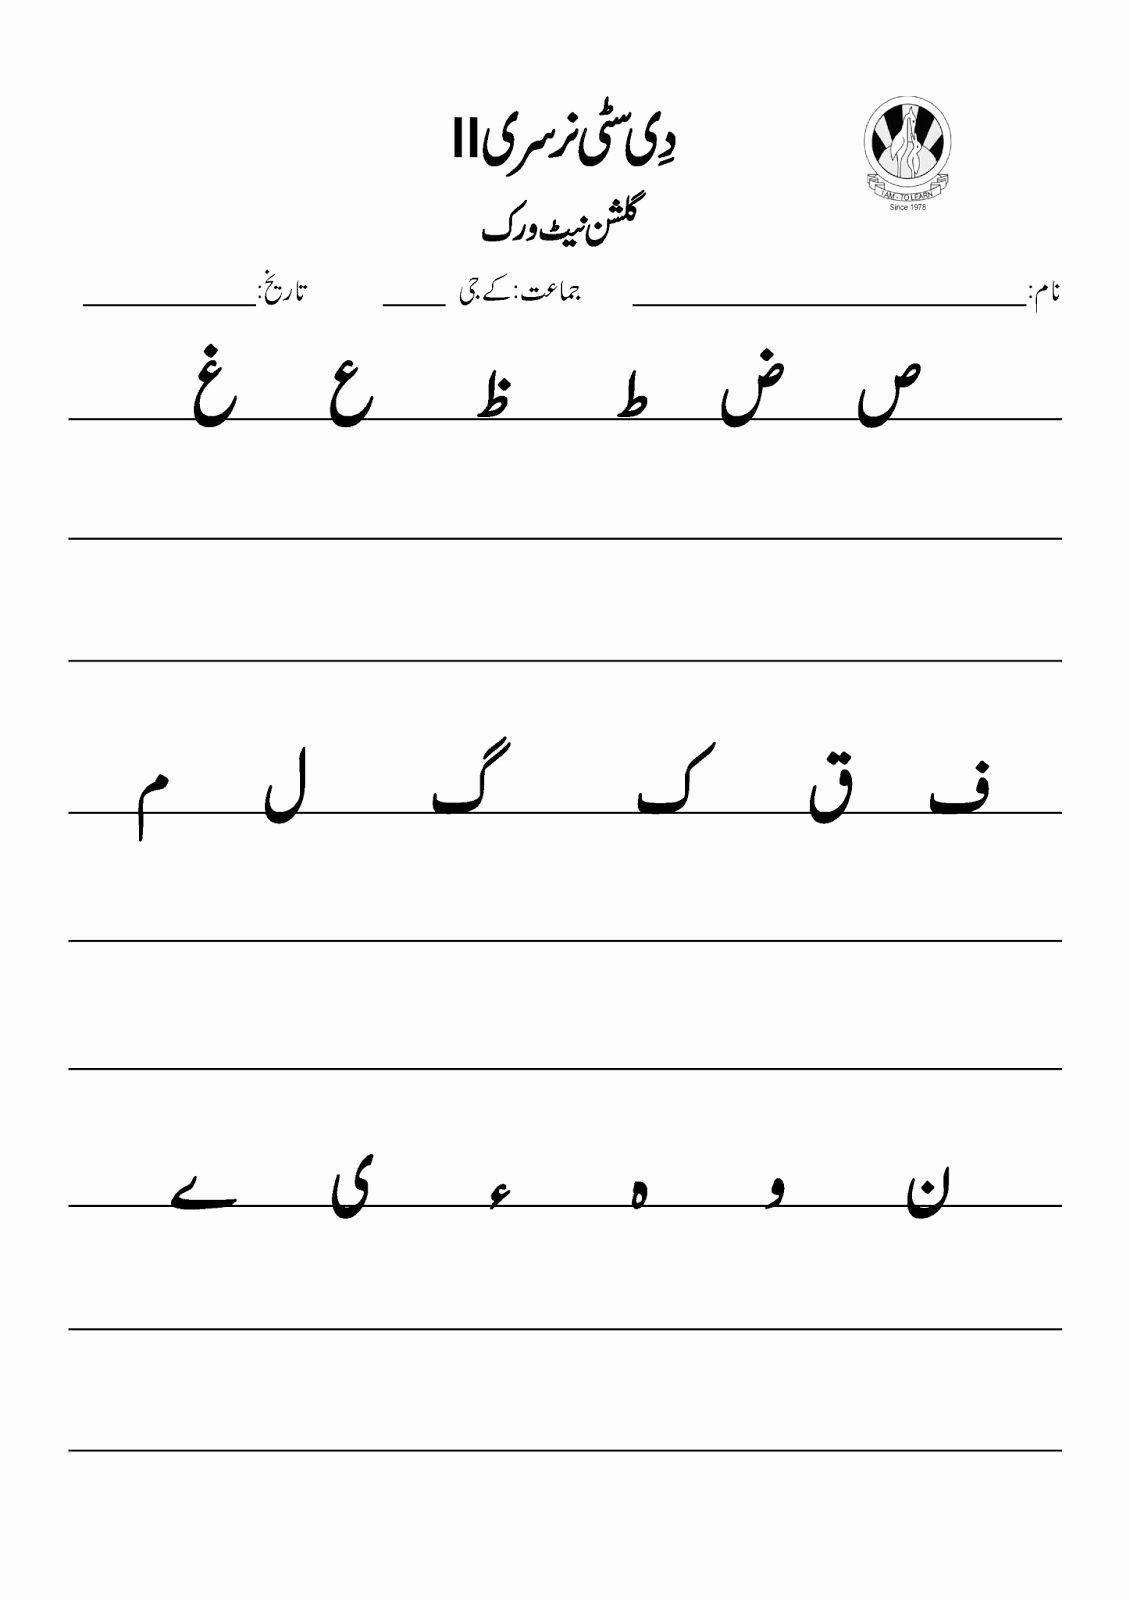 Urdu Worksheets for Preschoolers Lovely Sr Gulshan the City Nursery Ii Urdu First Term